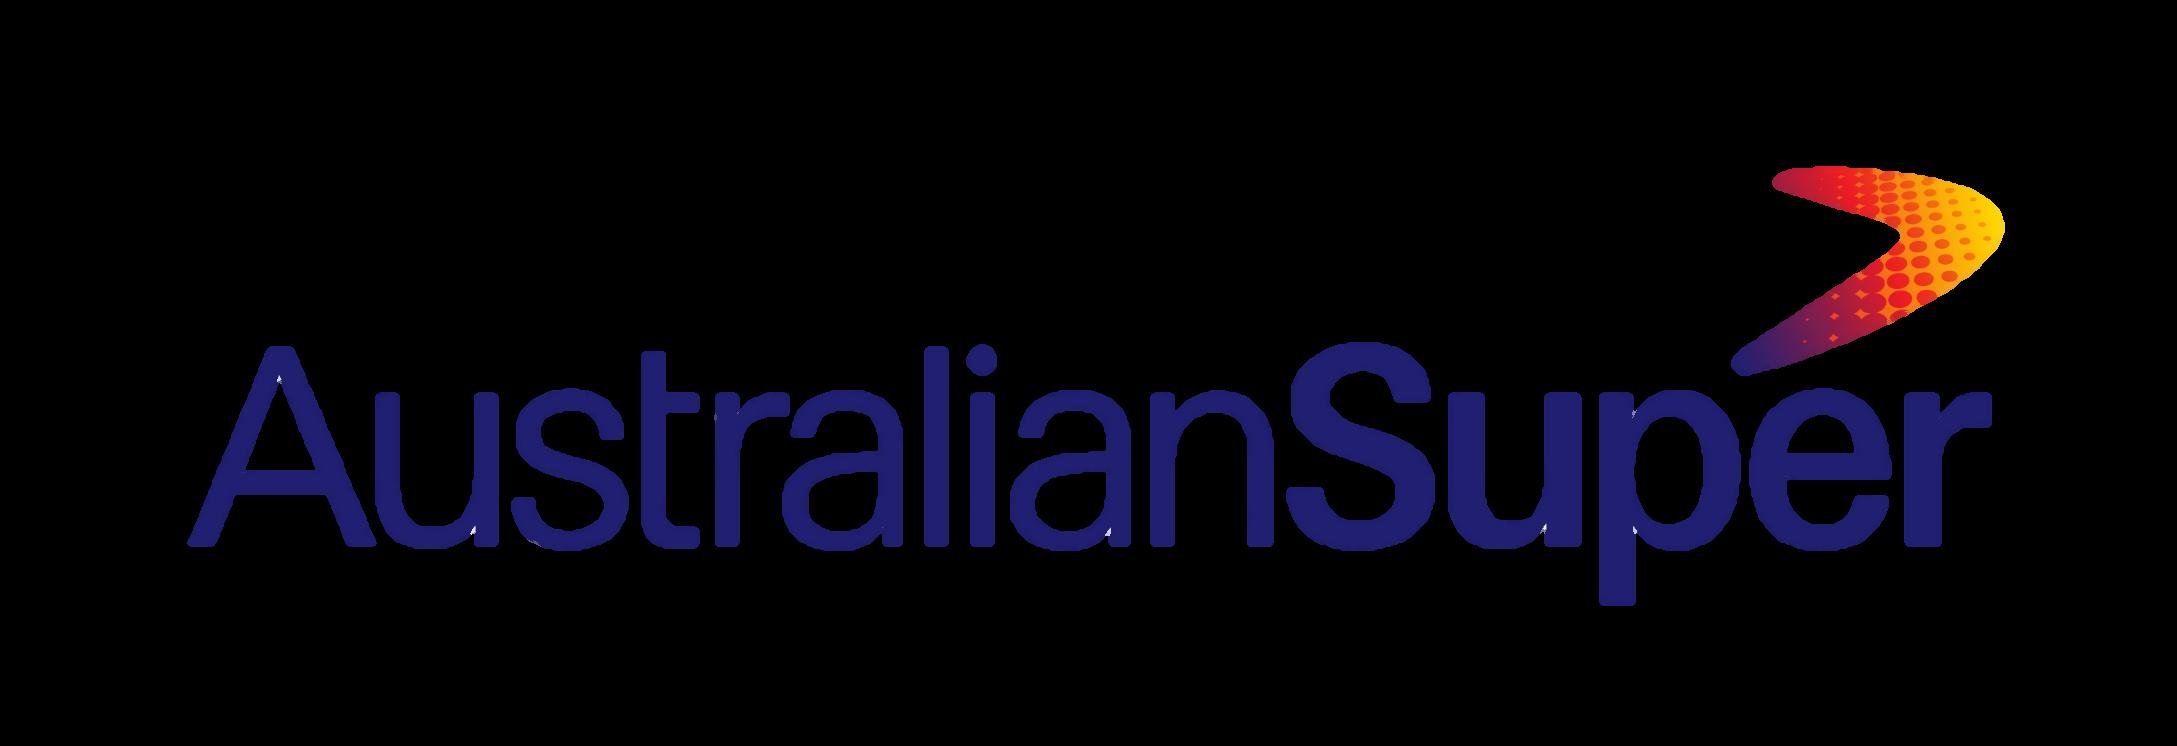 AustralianSuper logo